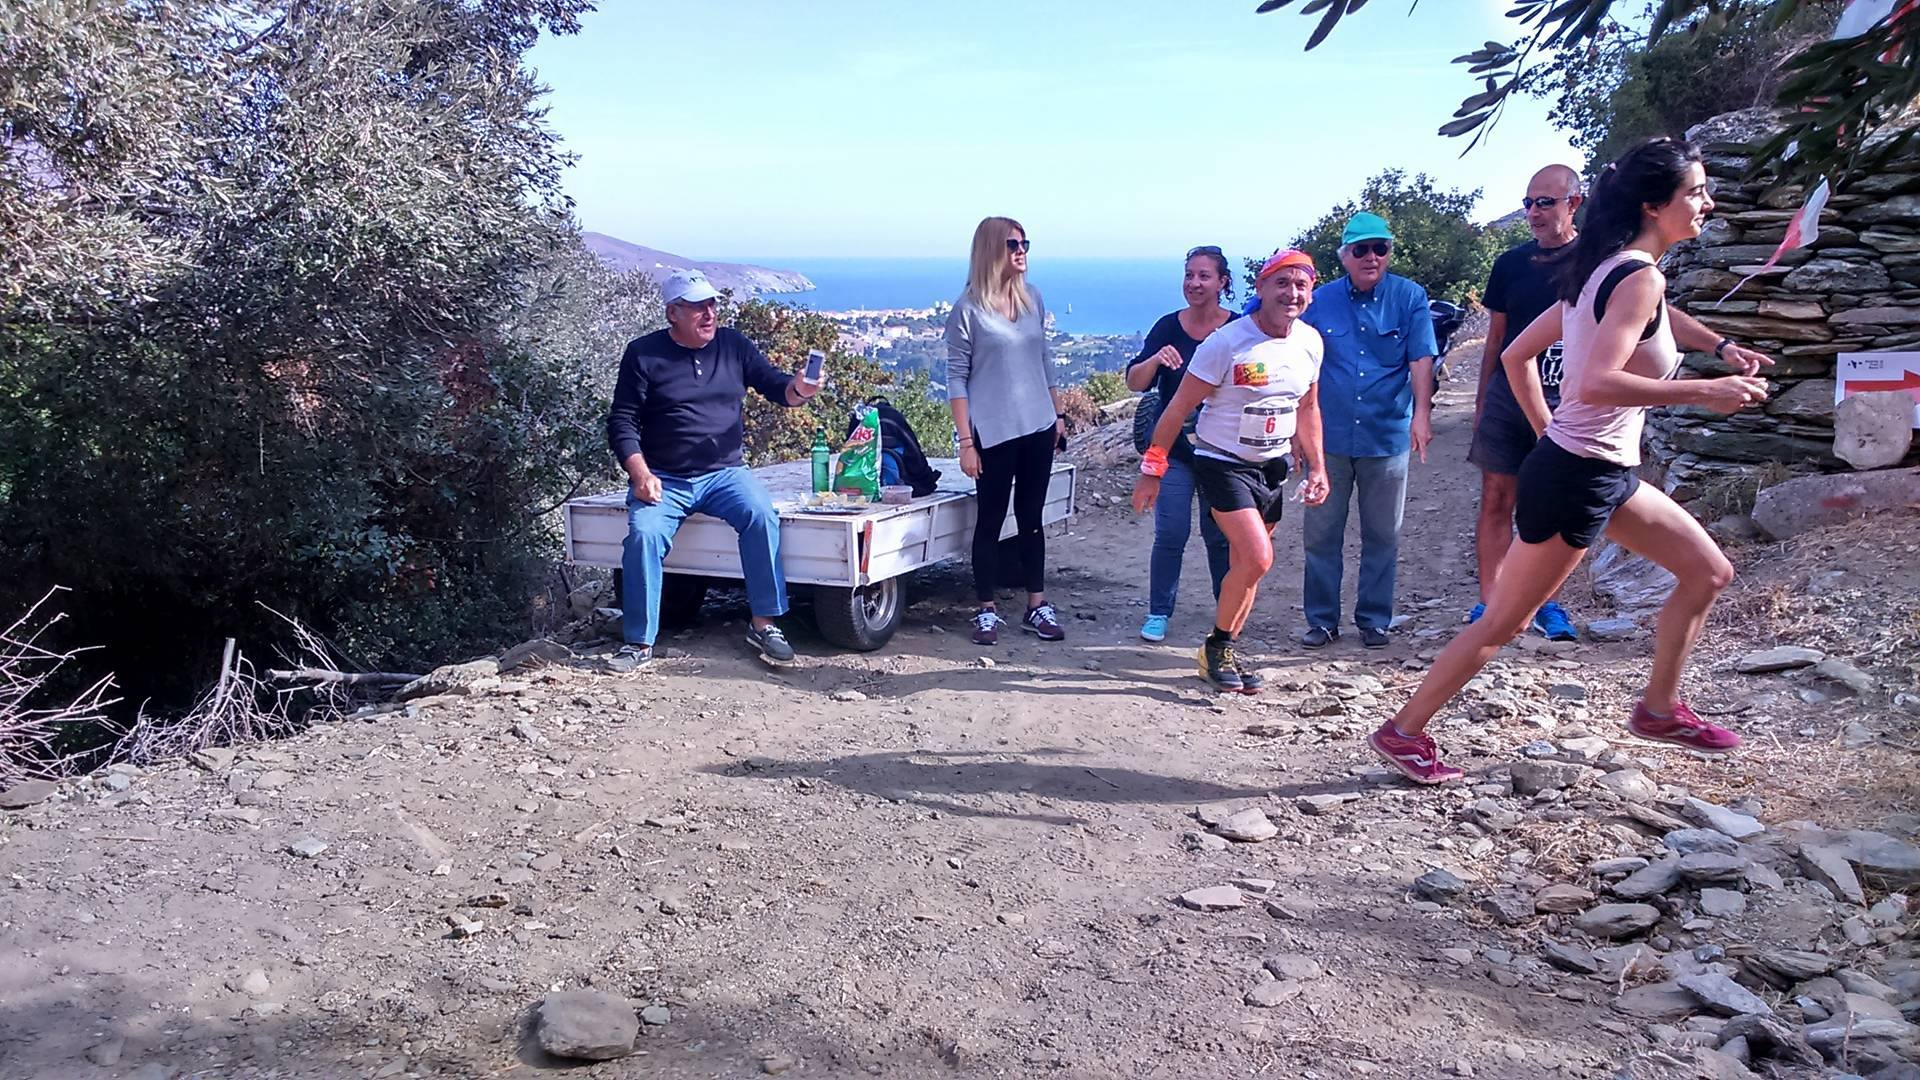 andros-trail-race-leivadia-station-2-oct-hariclia-daniolou-fotos-7